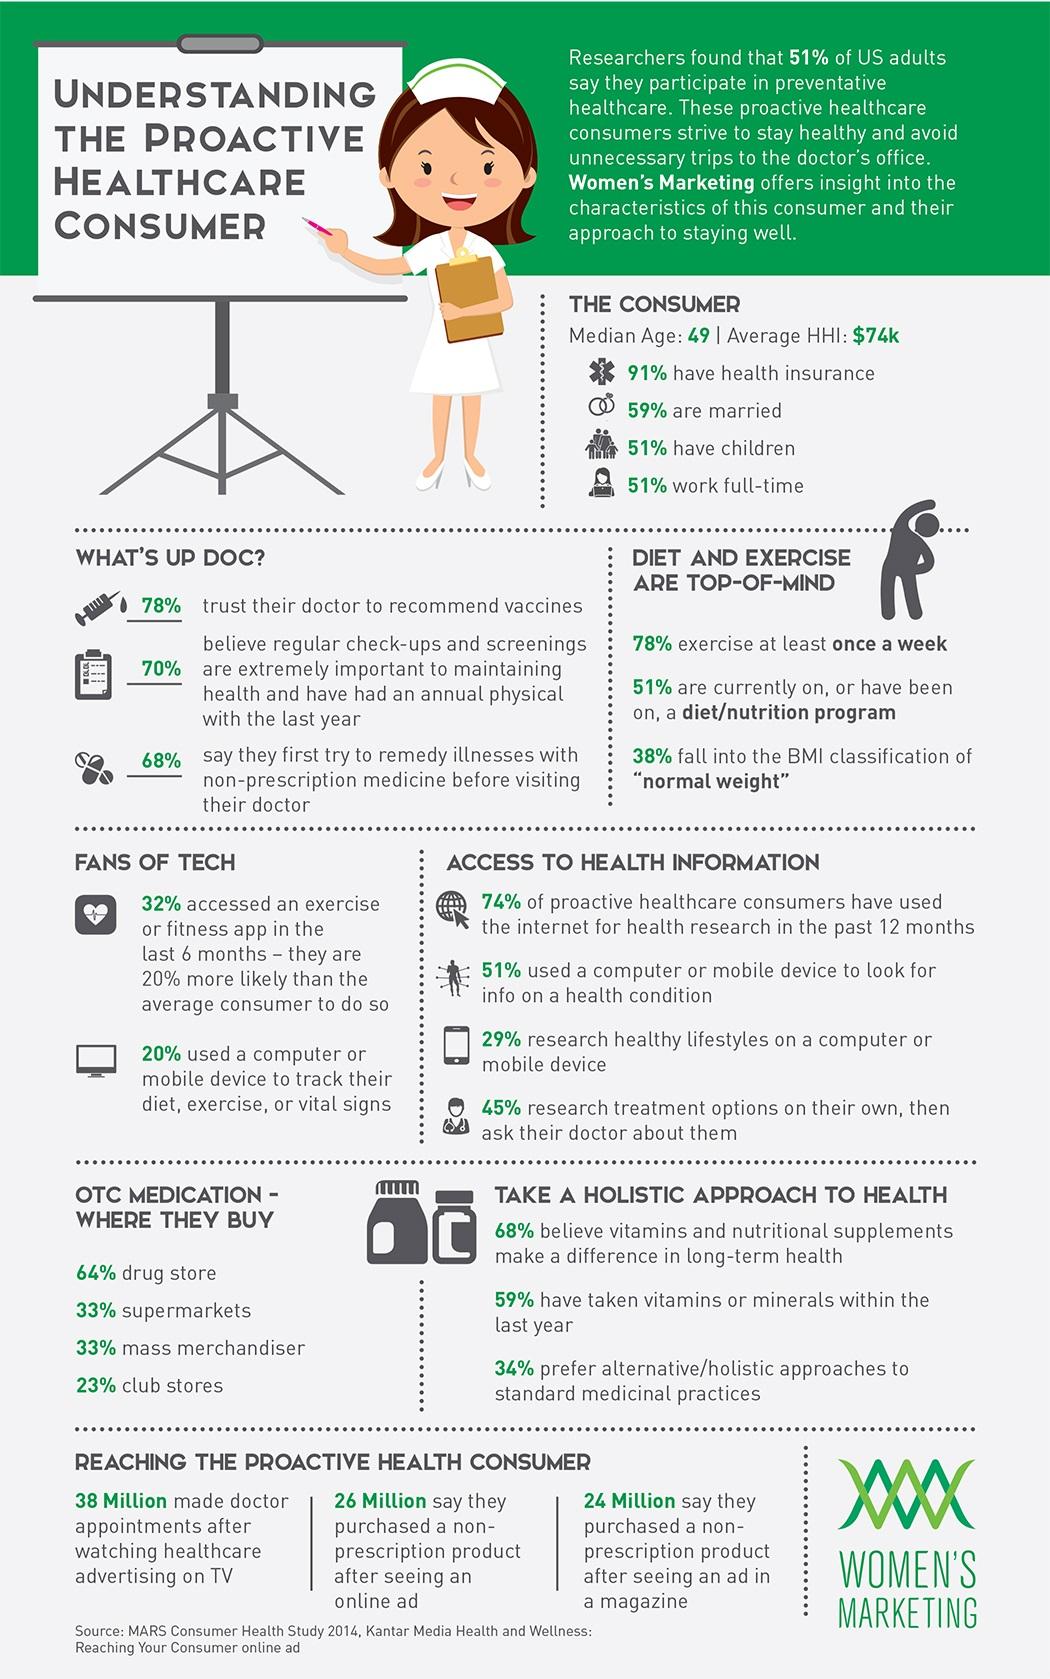 Women's Marketing - Healthcare Consumer Trends